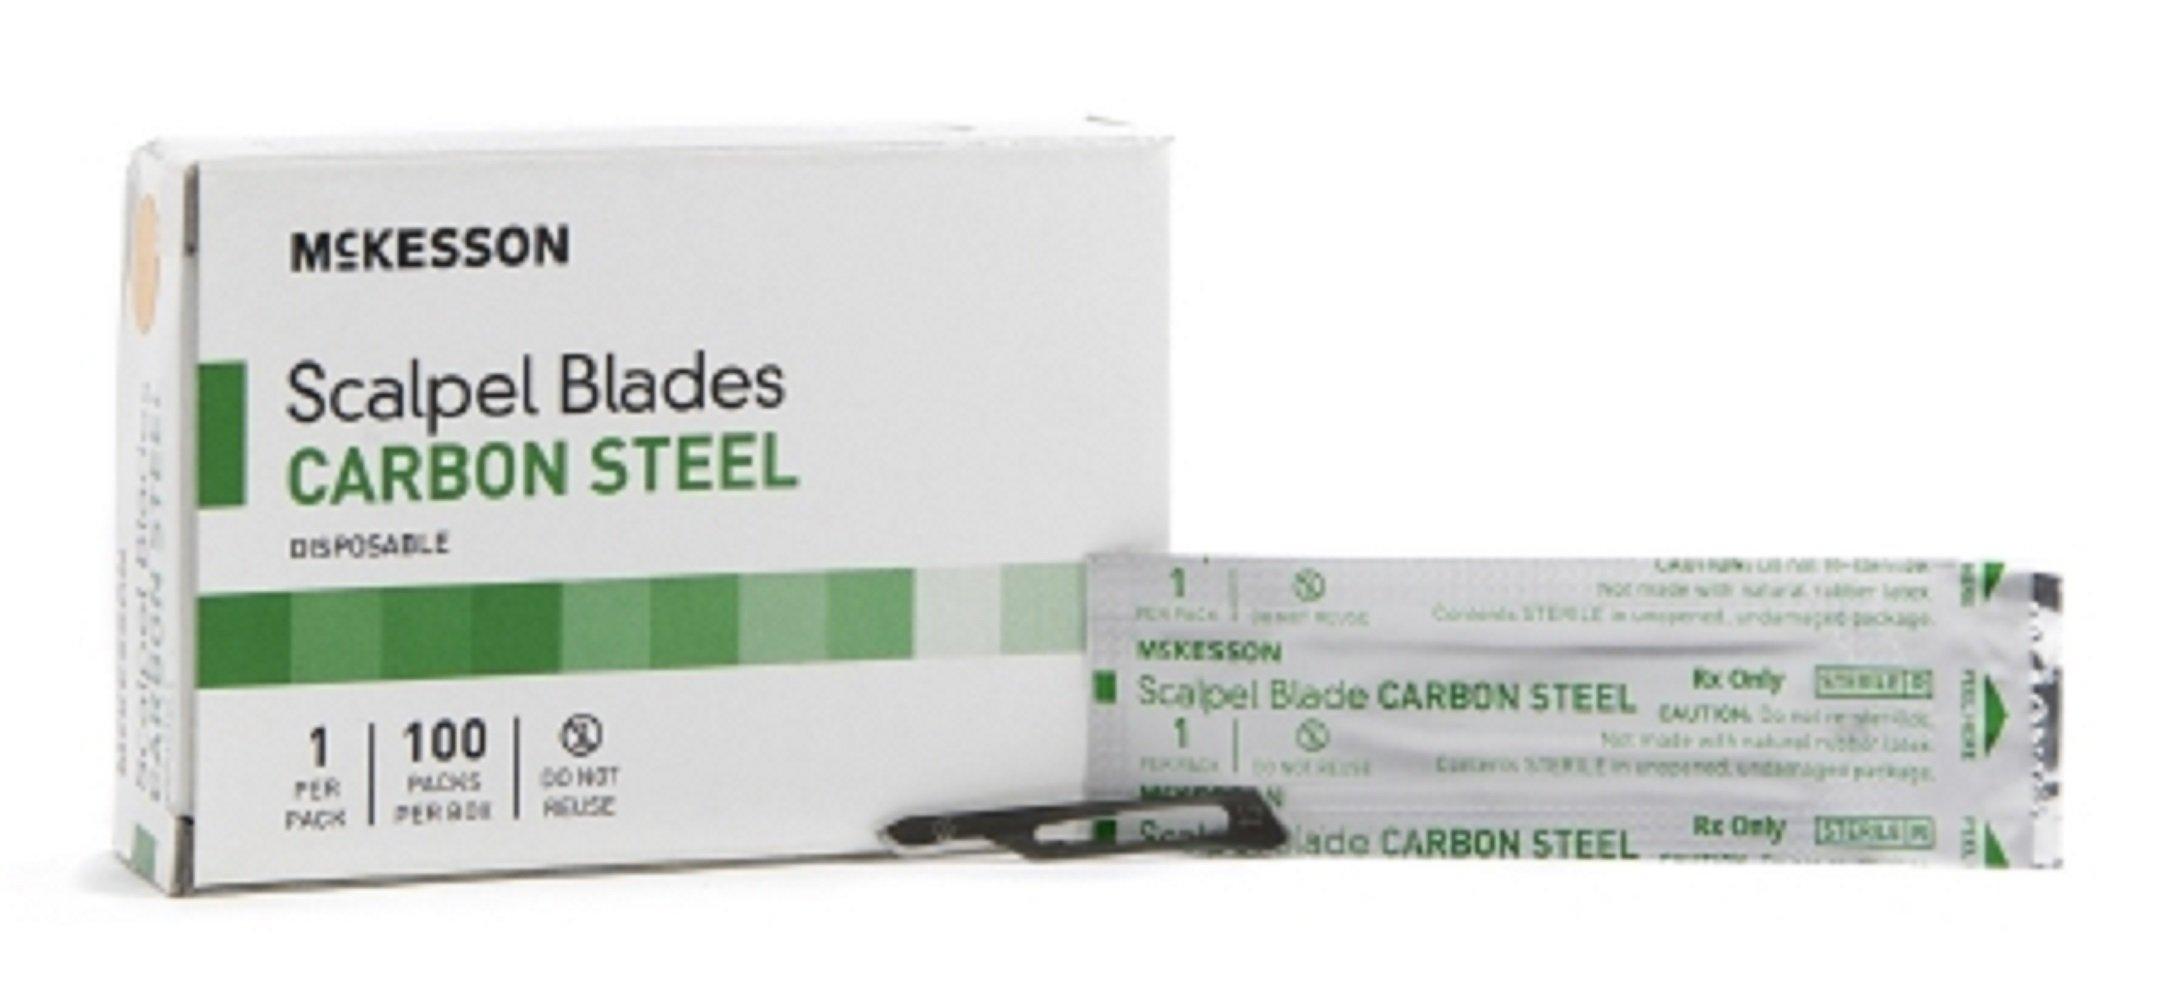 McKesson Brand - Surgical Blade - Carbon Steel - Size 15 - Sterile Disposable - Knife Edge - 5000pcs/Case